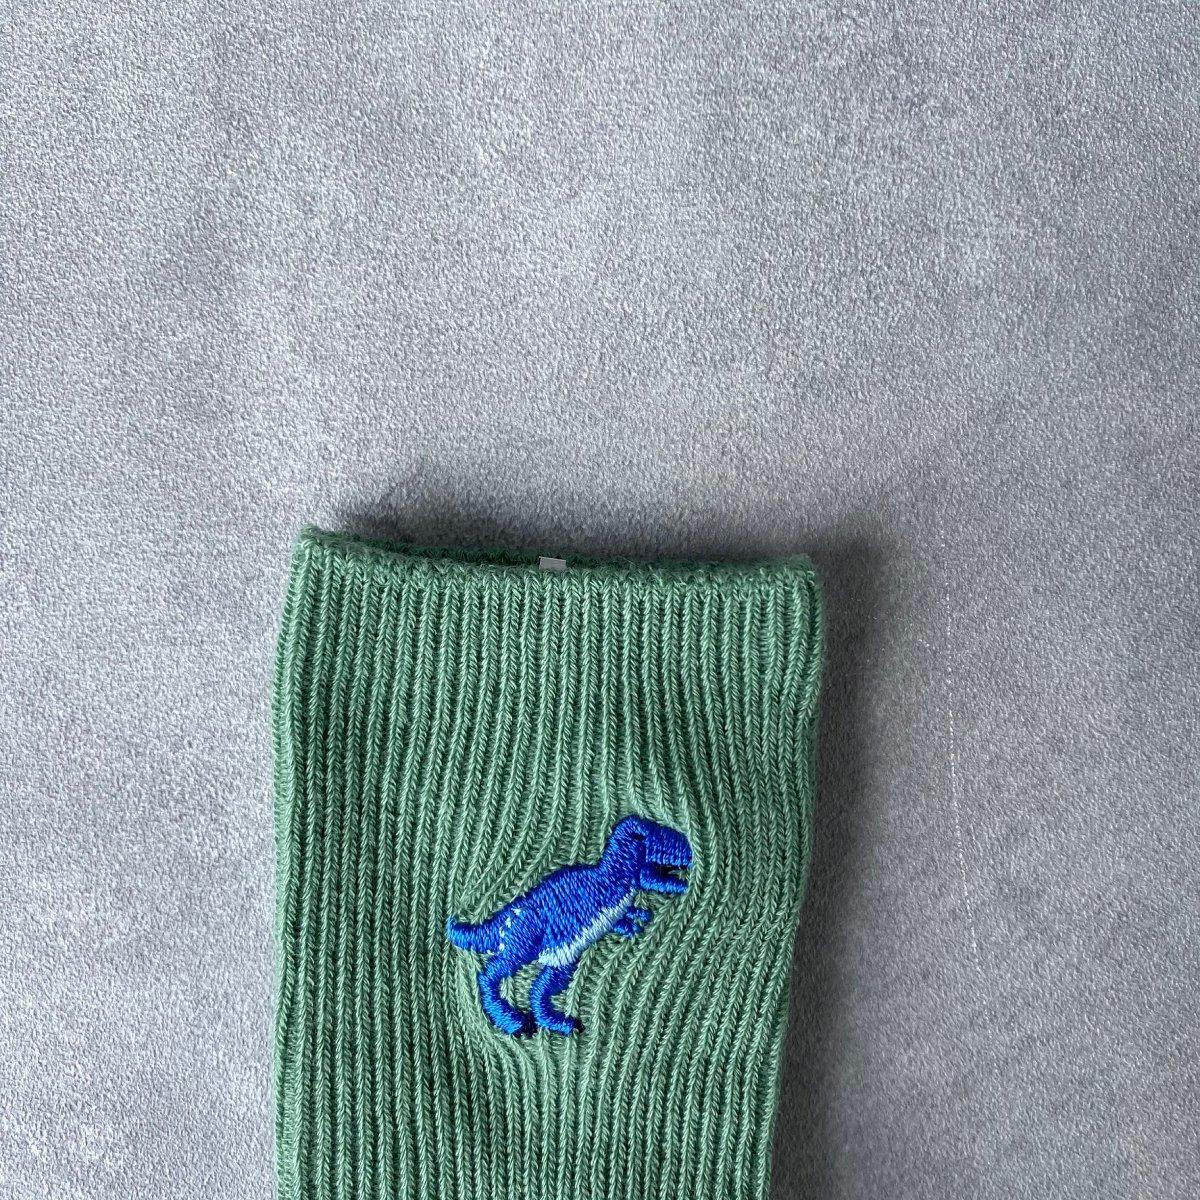 【BABY】Dino Socks 詳細画像12